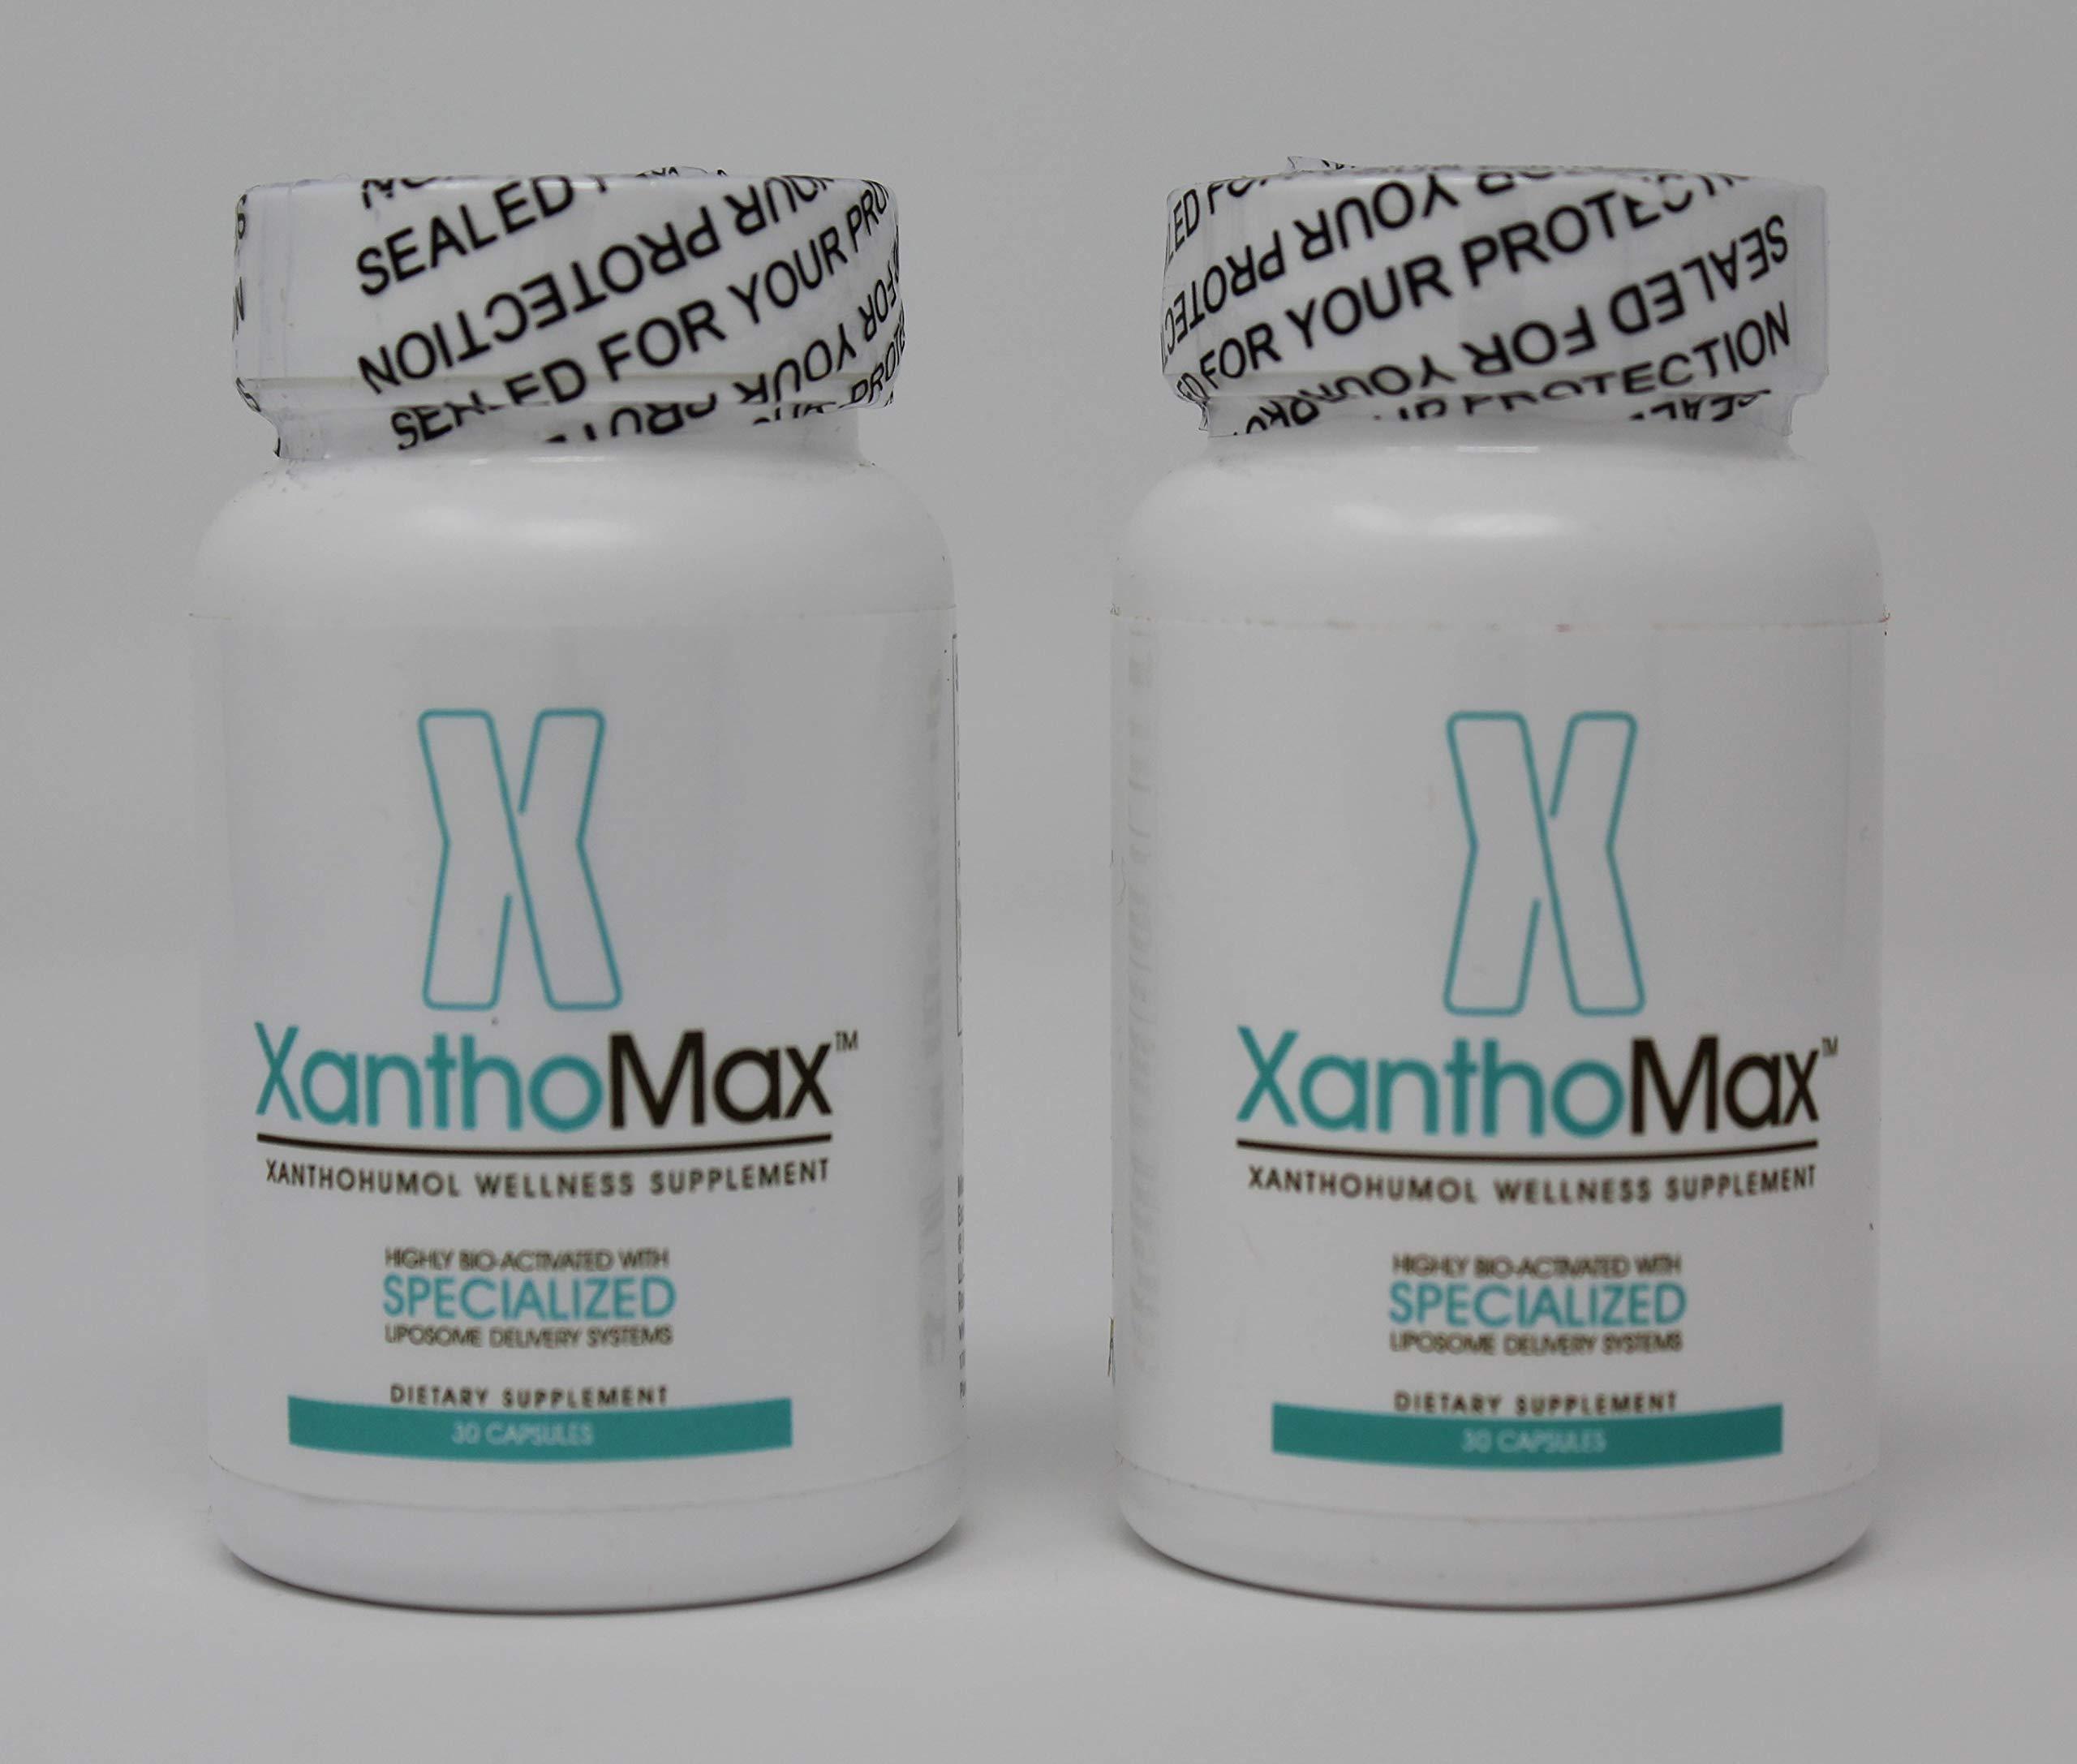 Xanthomax 30 caps (2 Bottles of 30 caps) by Elevacity